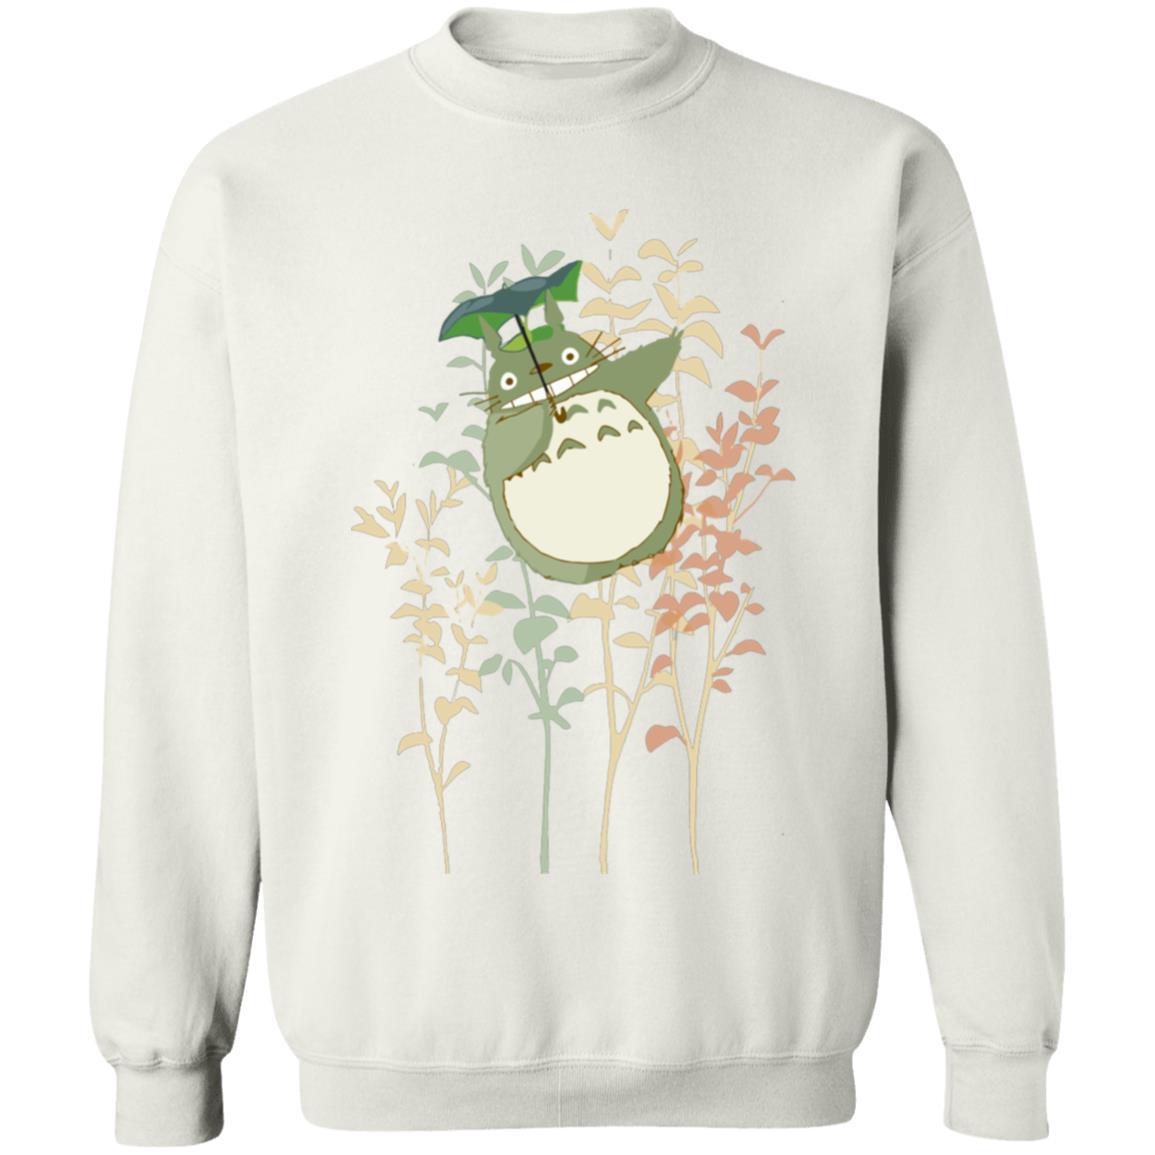 Totoro Sweatshirt Women New Design 2017 11 Styles